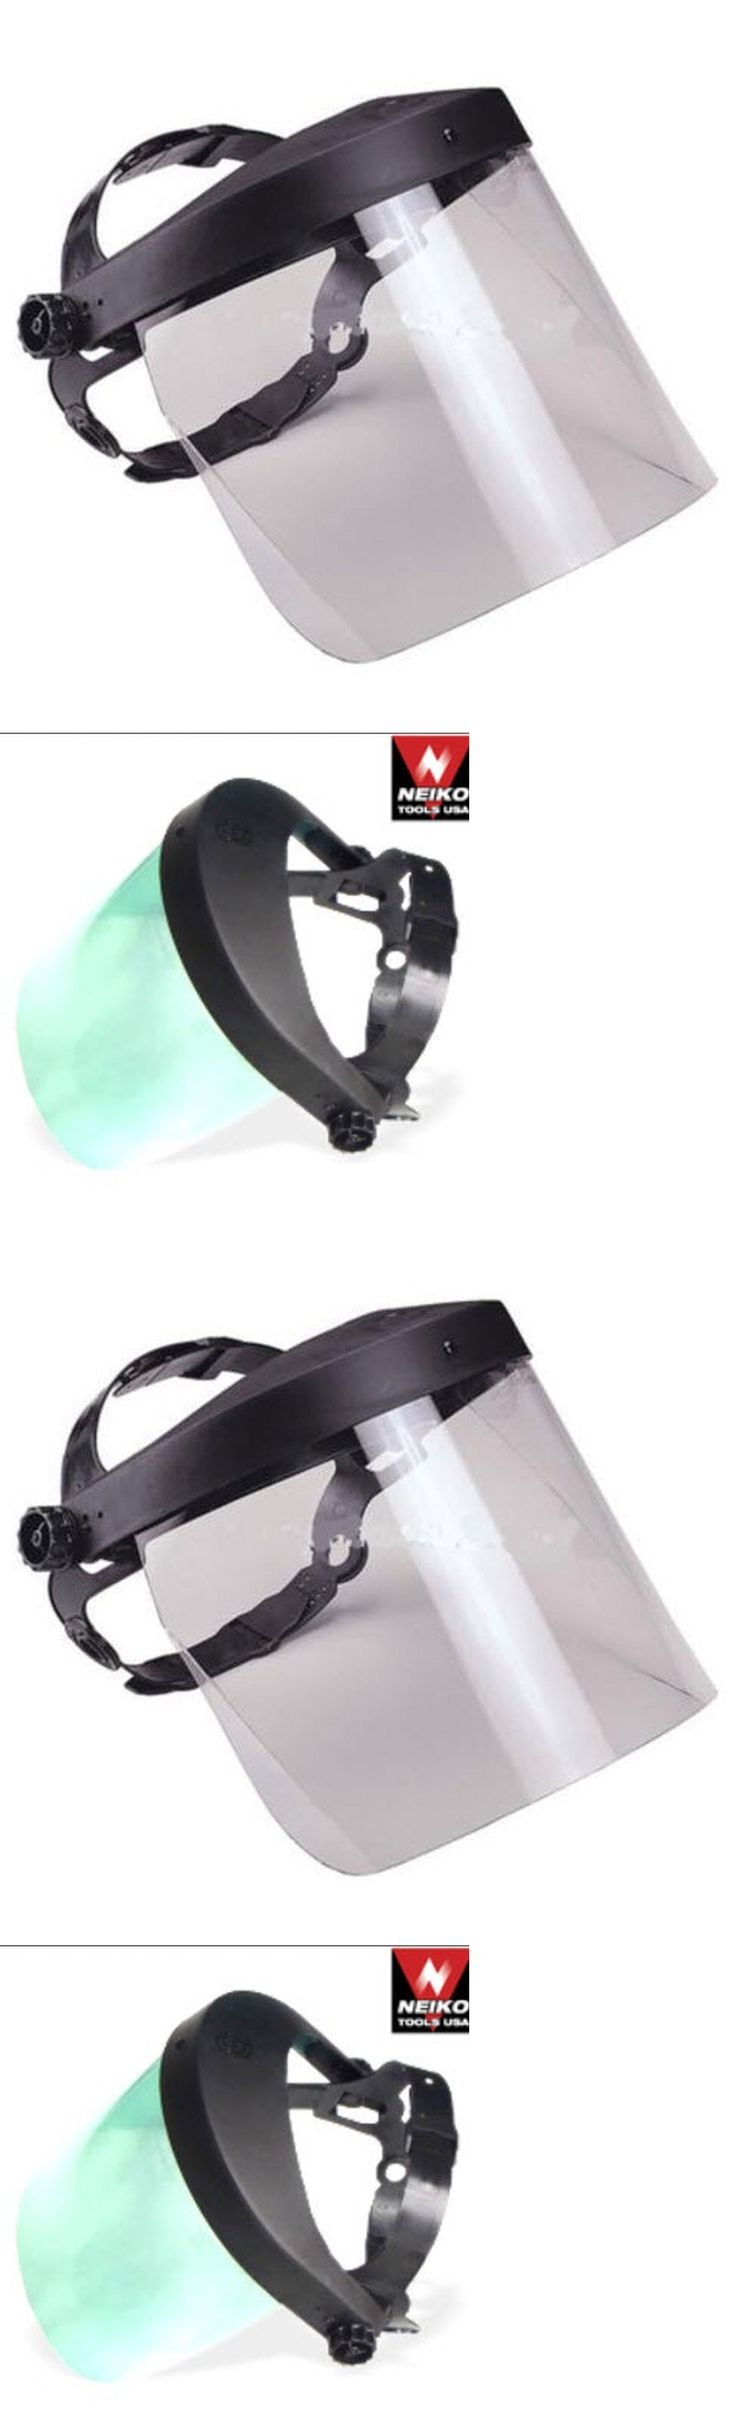 Glasses Goggles and Shields 43615 Neiko 53819A